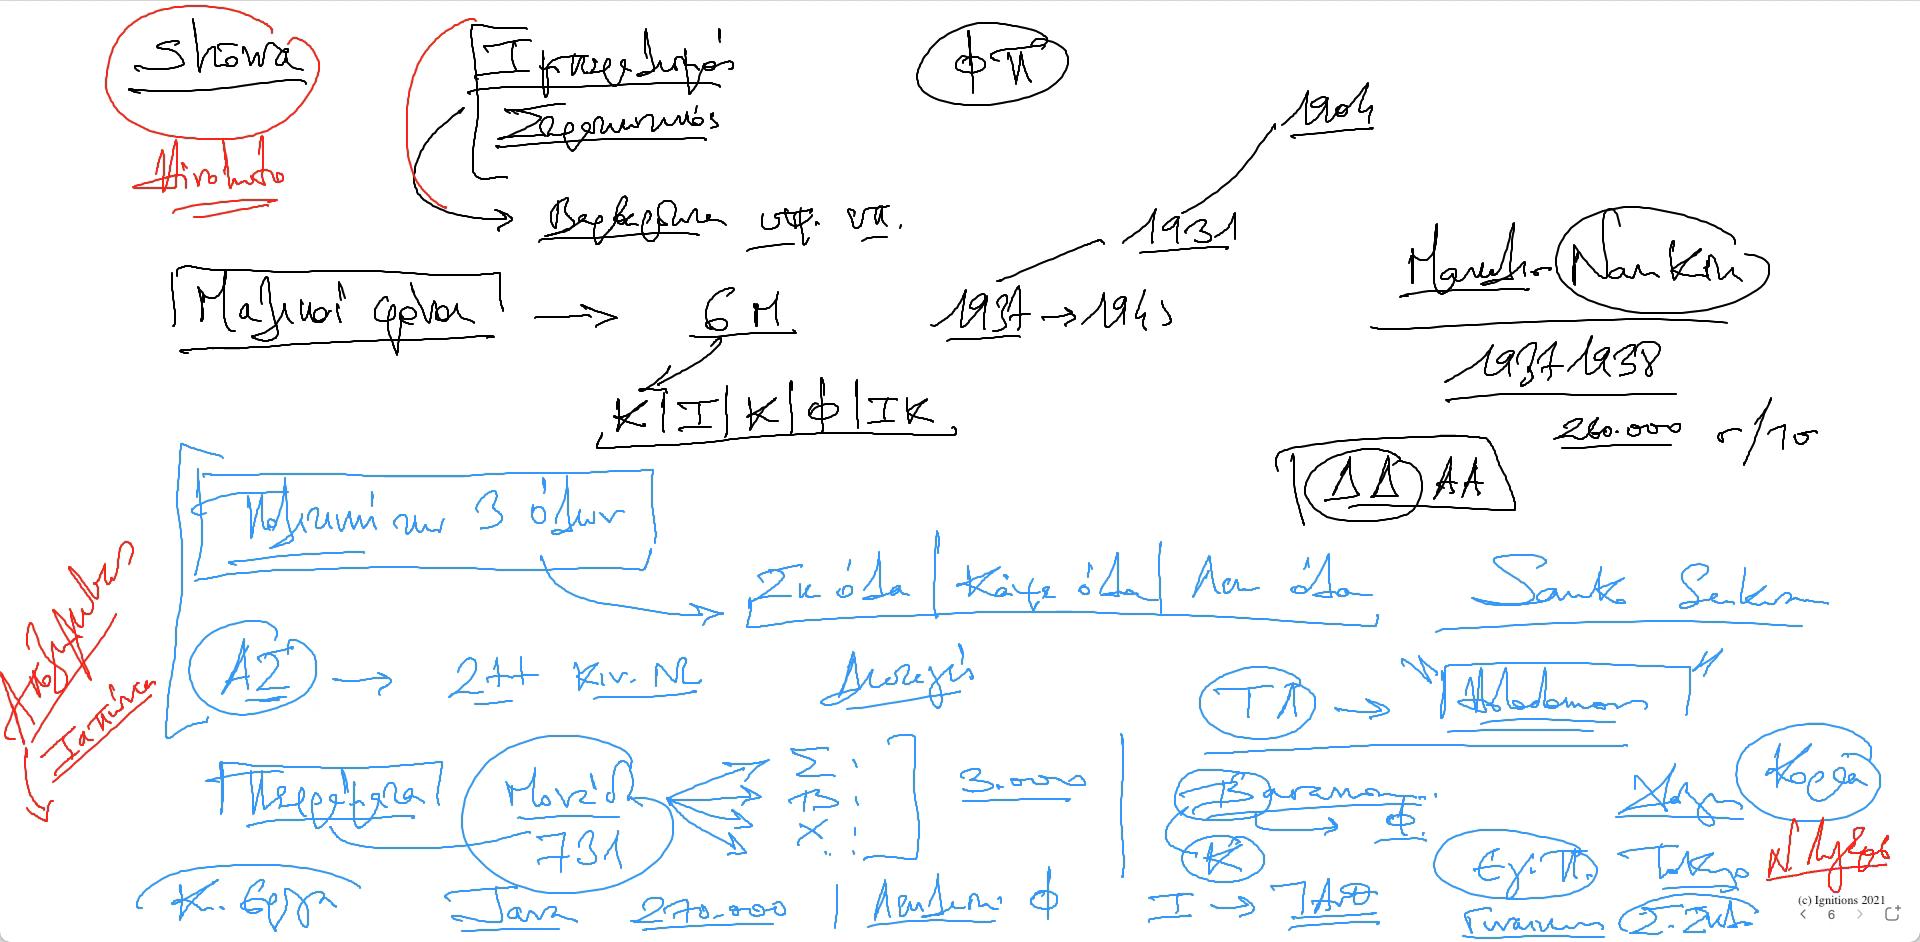 61445 - XII – 5ο Masterclass Βαθύτητας. (Dessin)